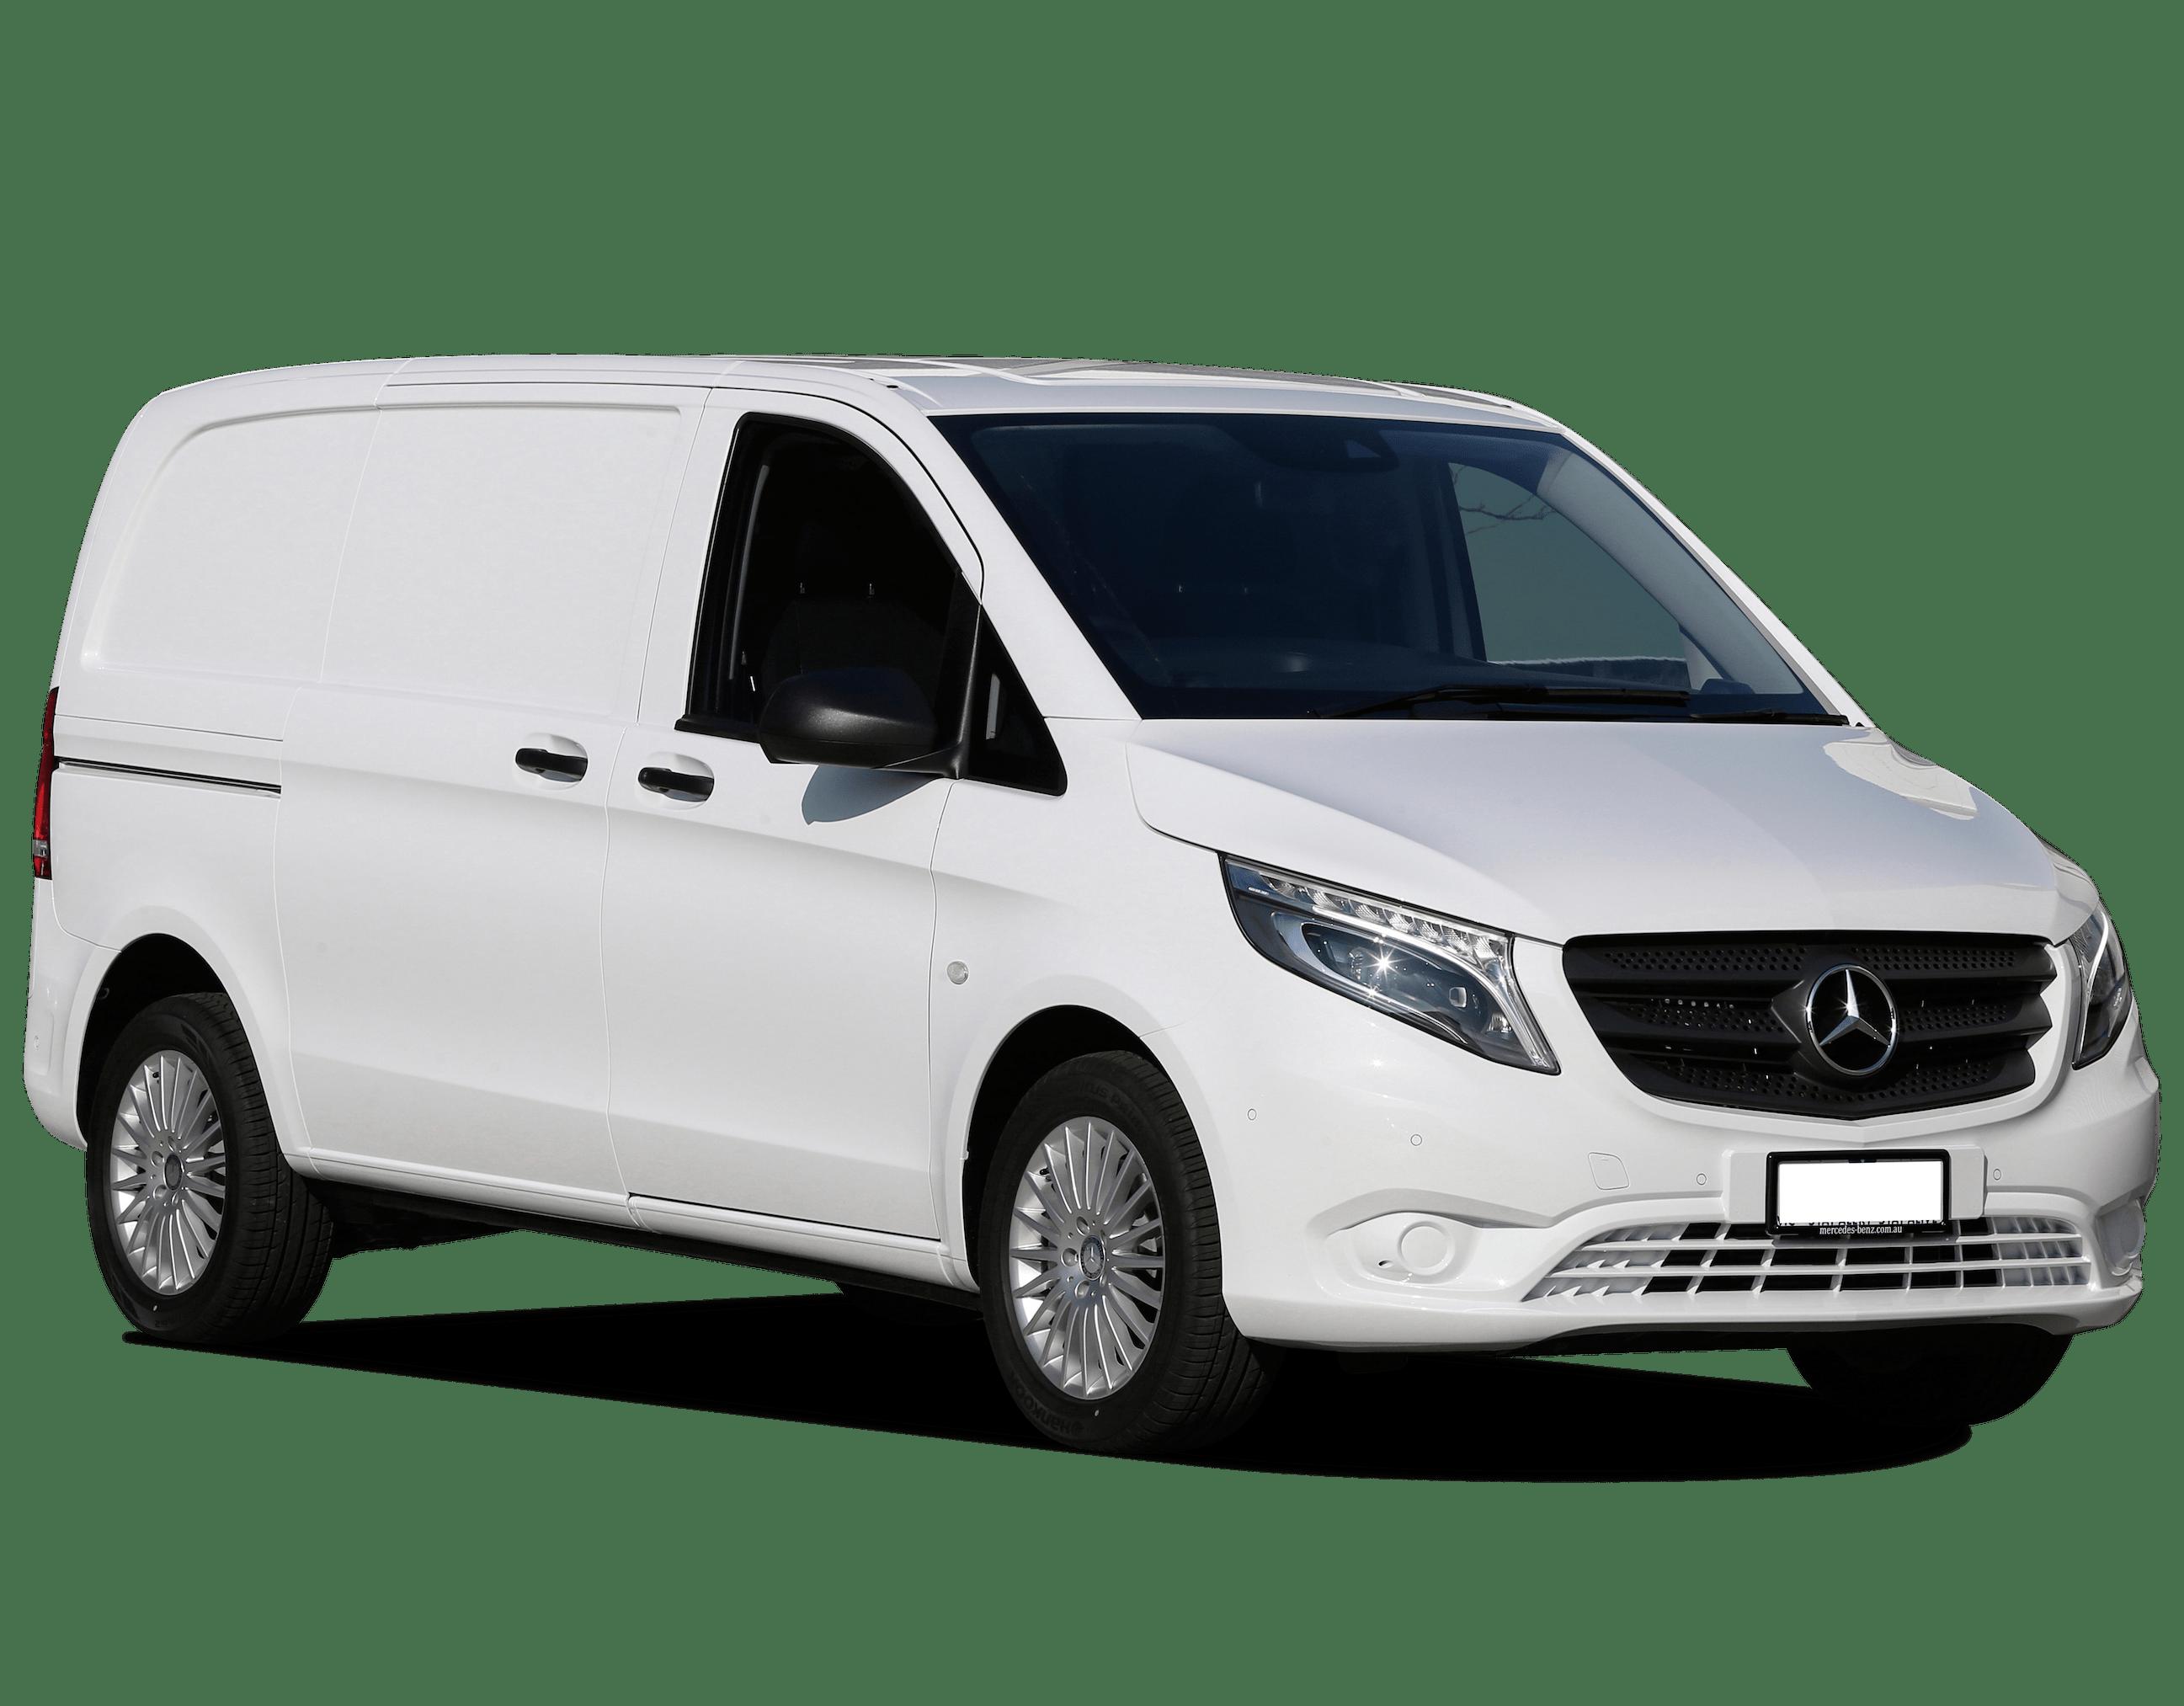 MercedesBenz Vito Reviews CarsGuide - Mercedes benz commercial vans